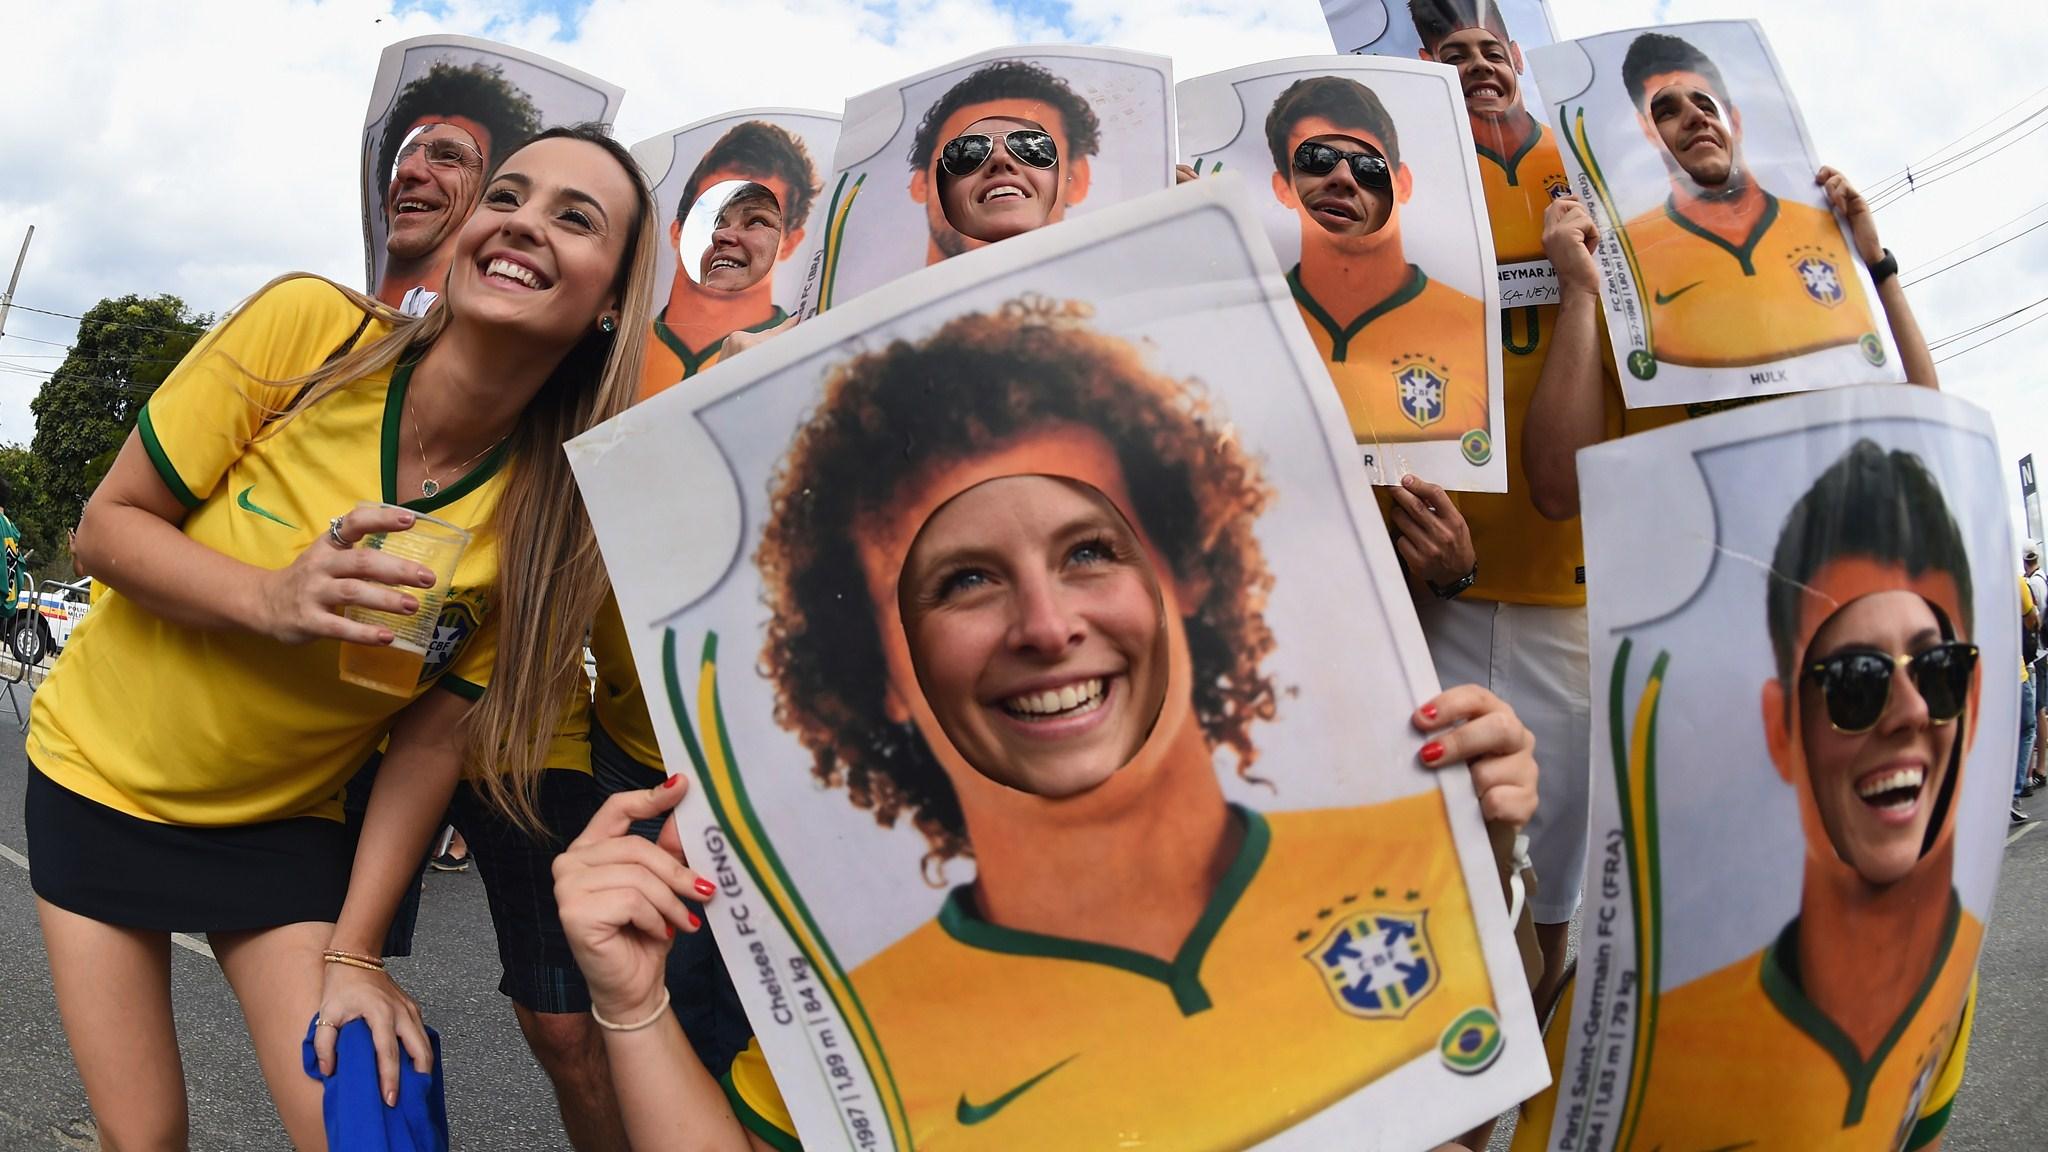 210 - Brazil-Germany [1-7] -- 08 Jul 2014 - 17-00 - kuaza